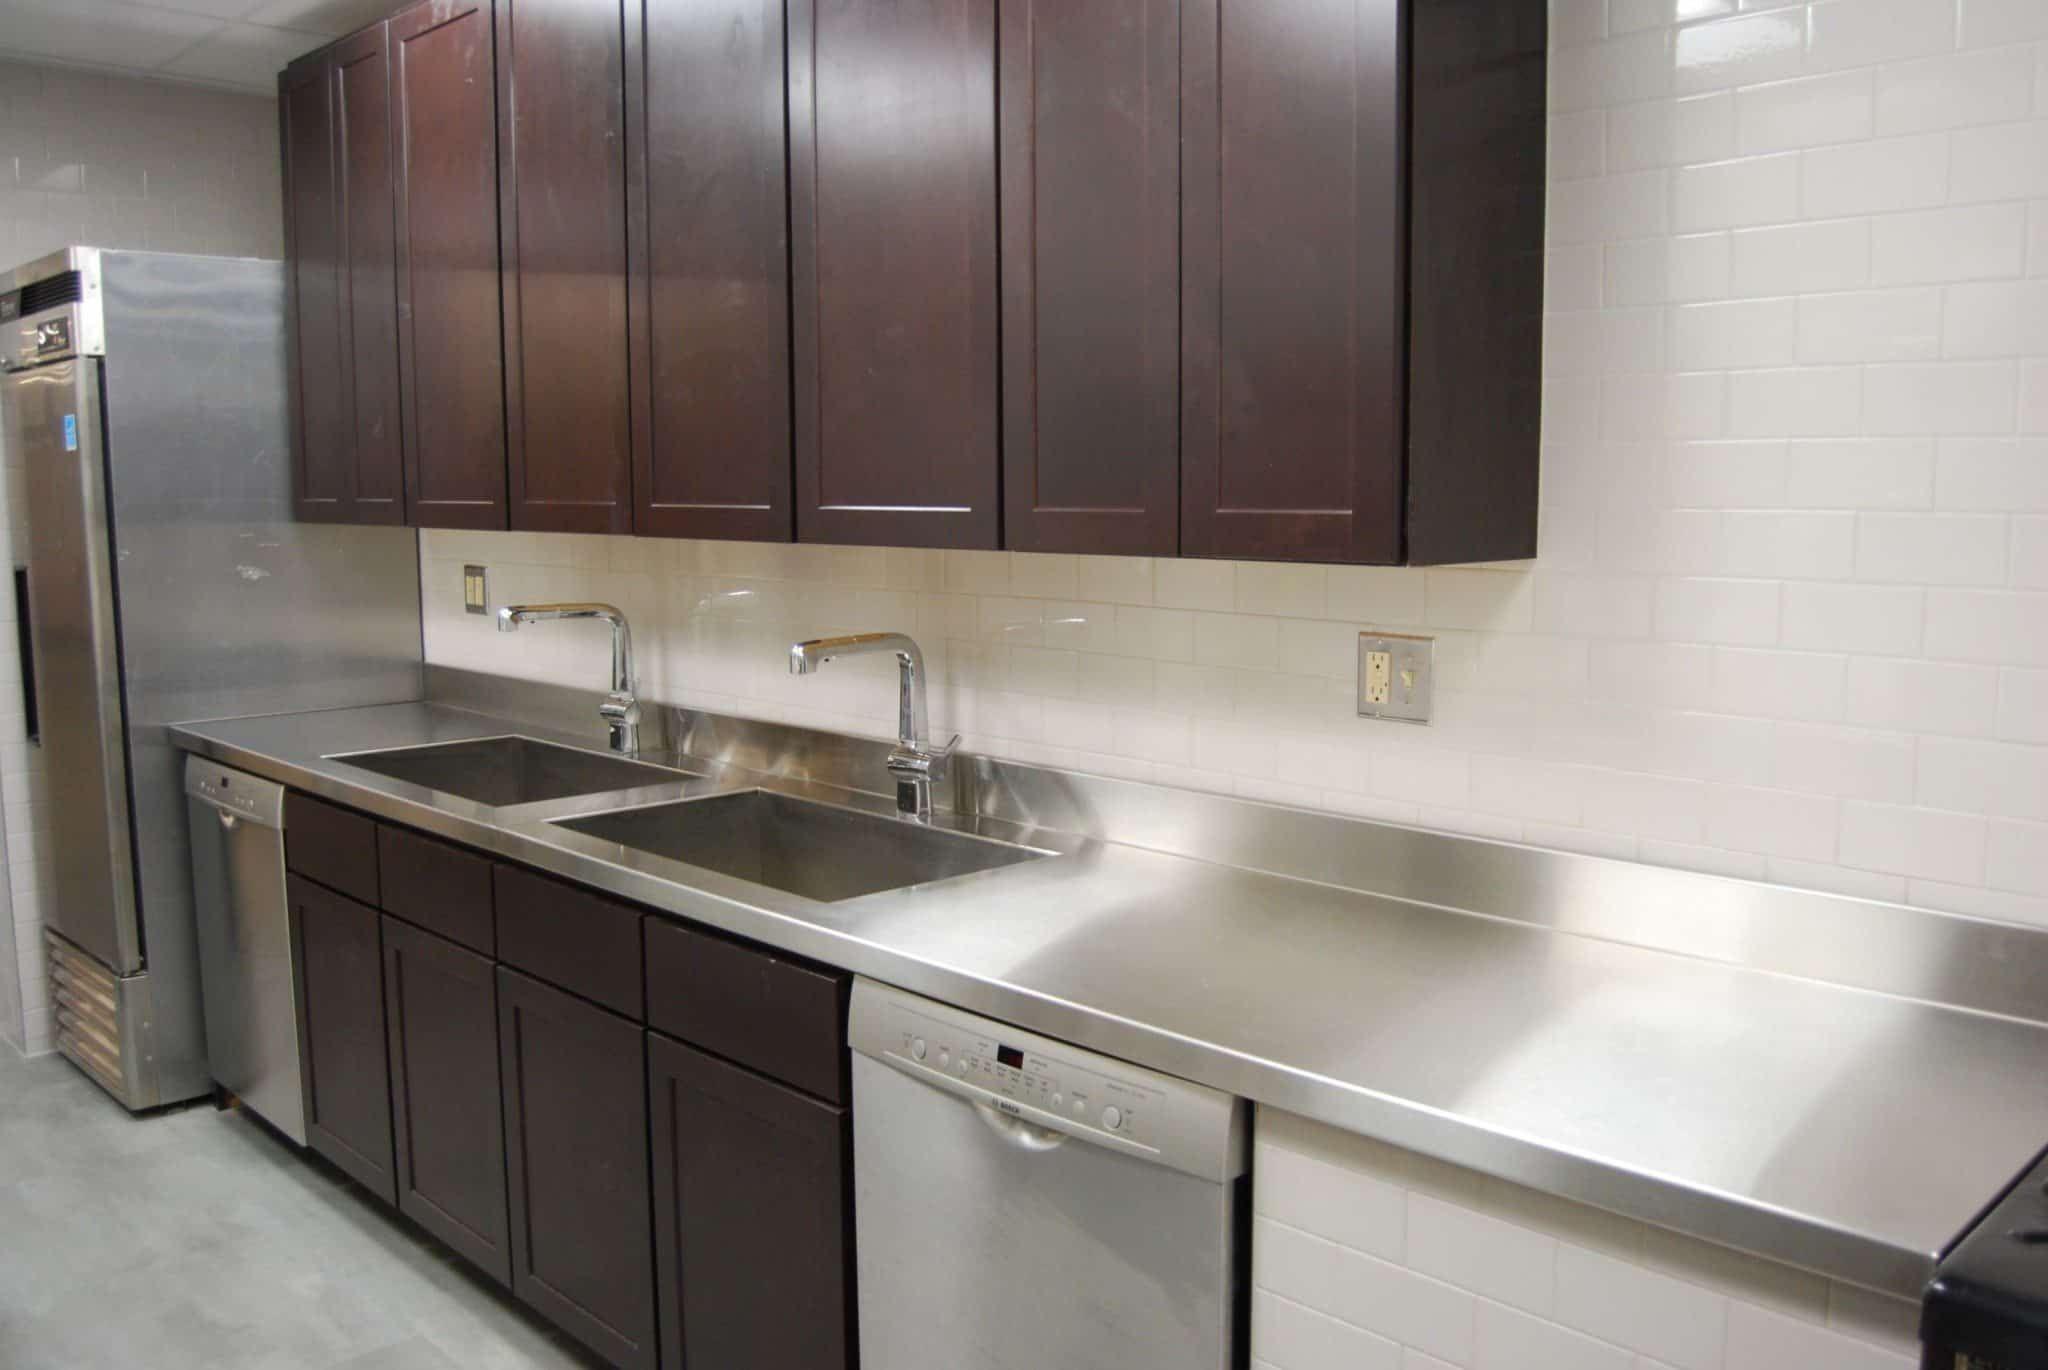 replacing kitchen countertops